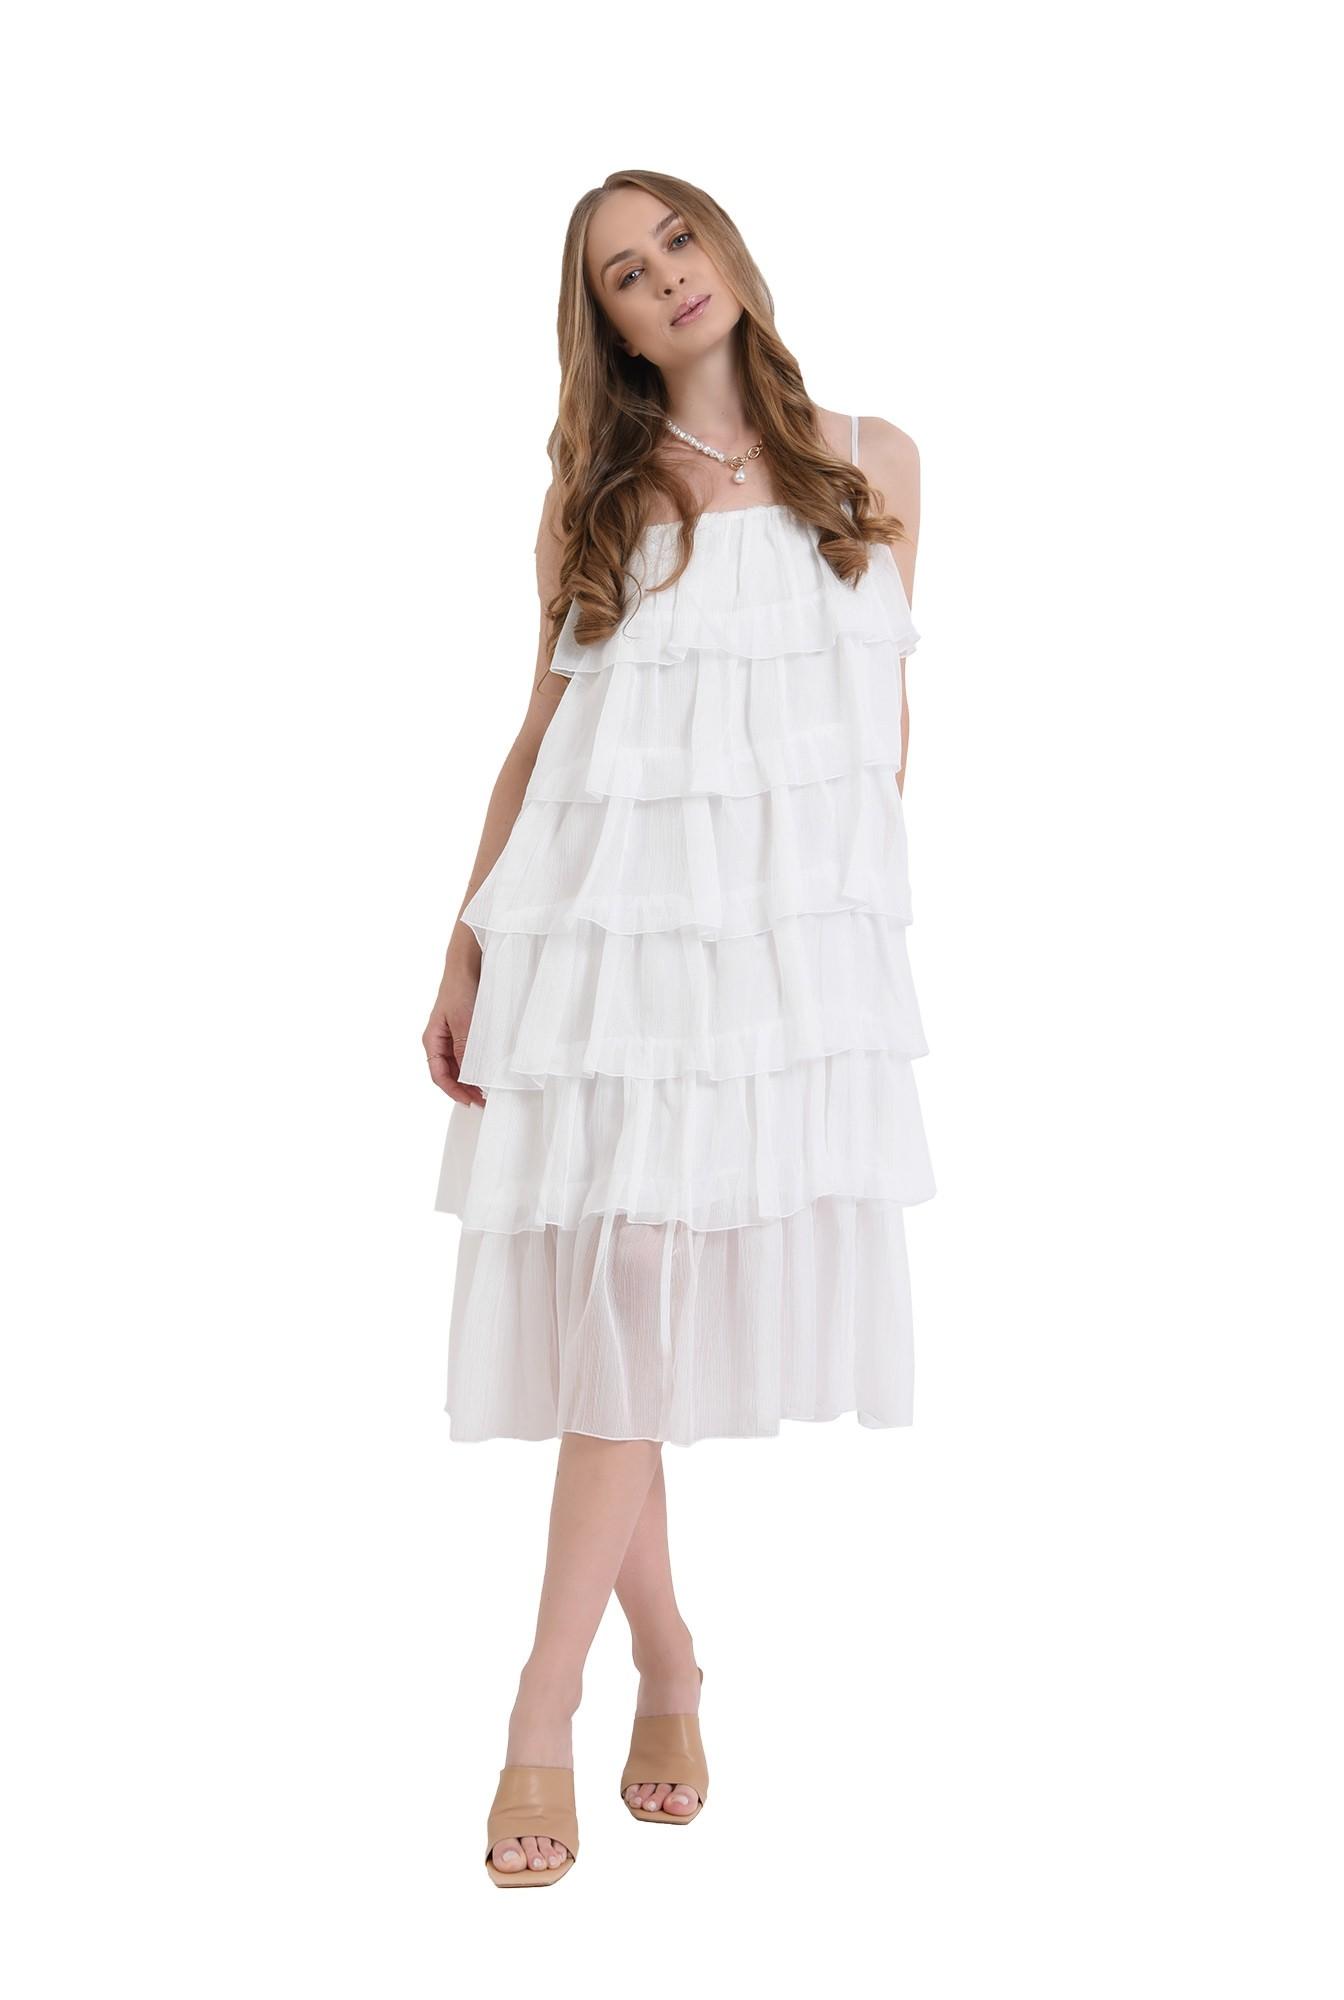 3 - rochie midi, alba, cu bretele subtiri